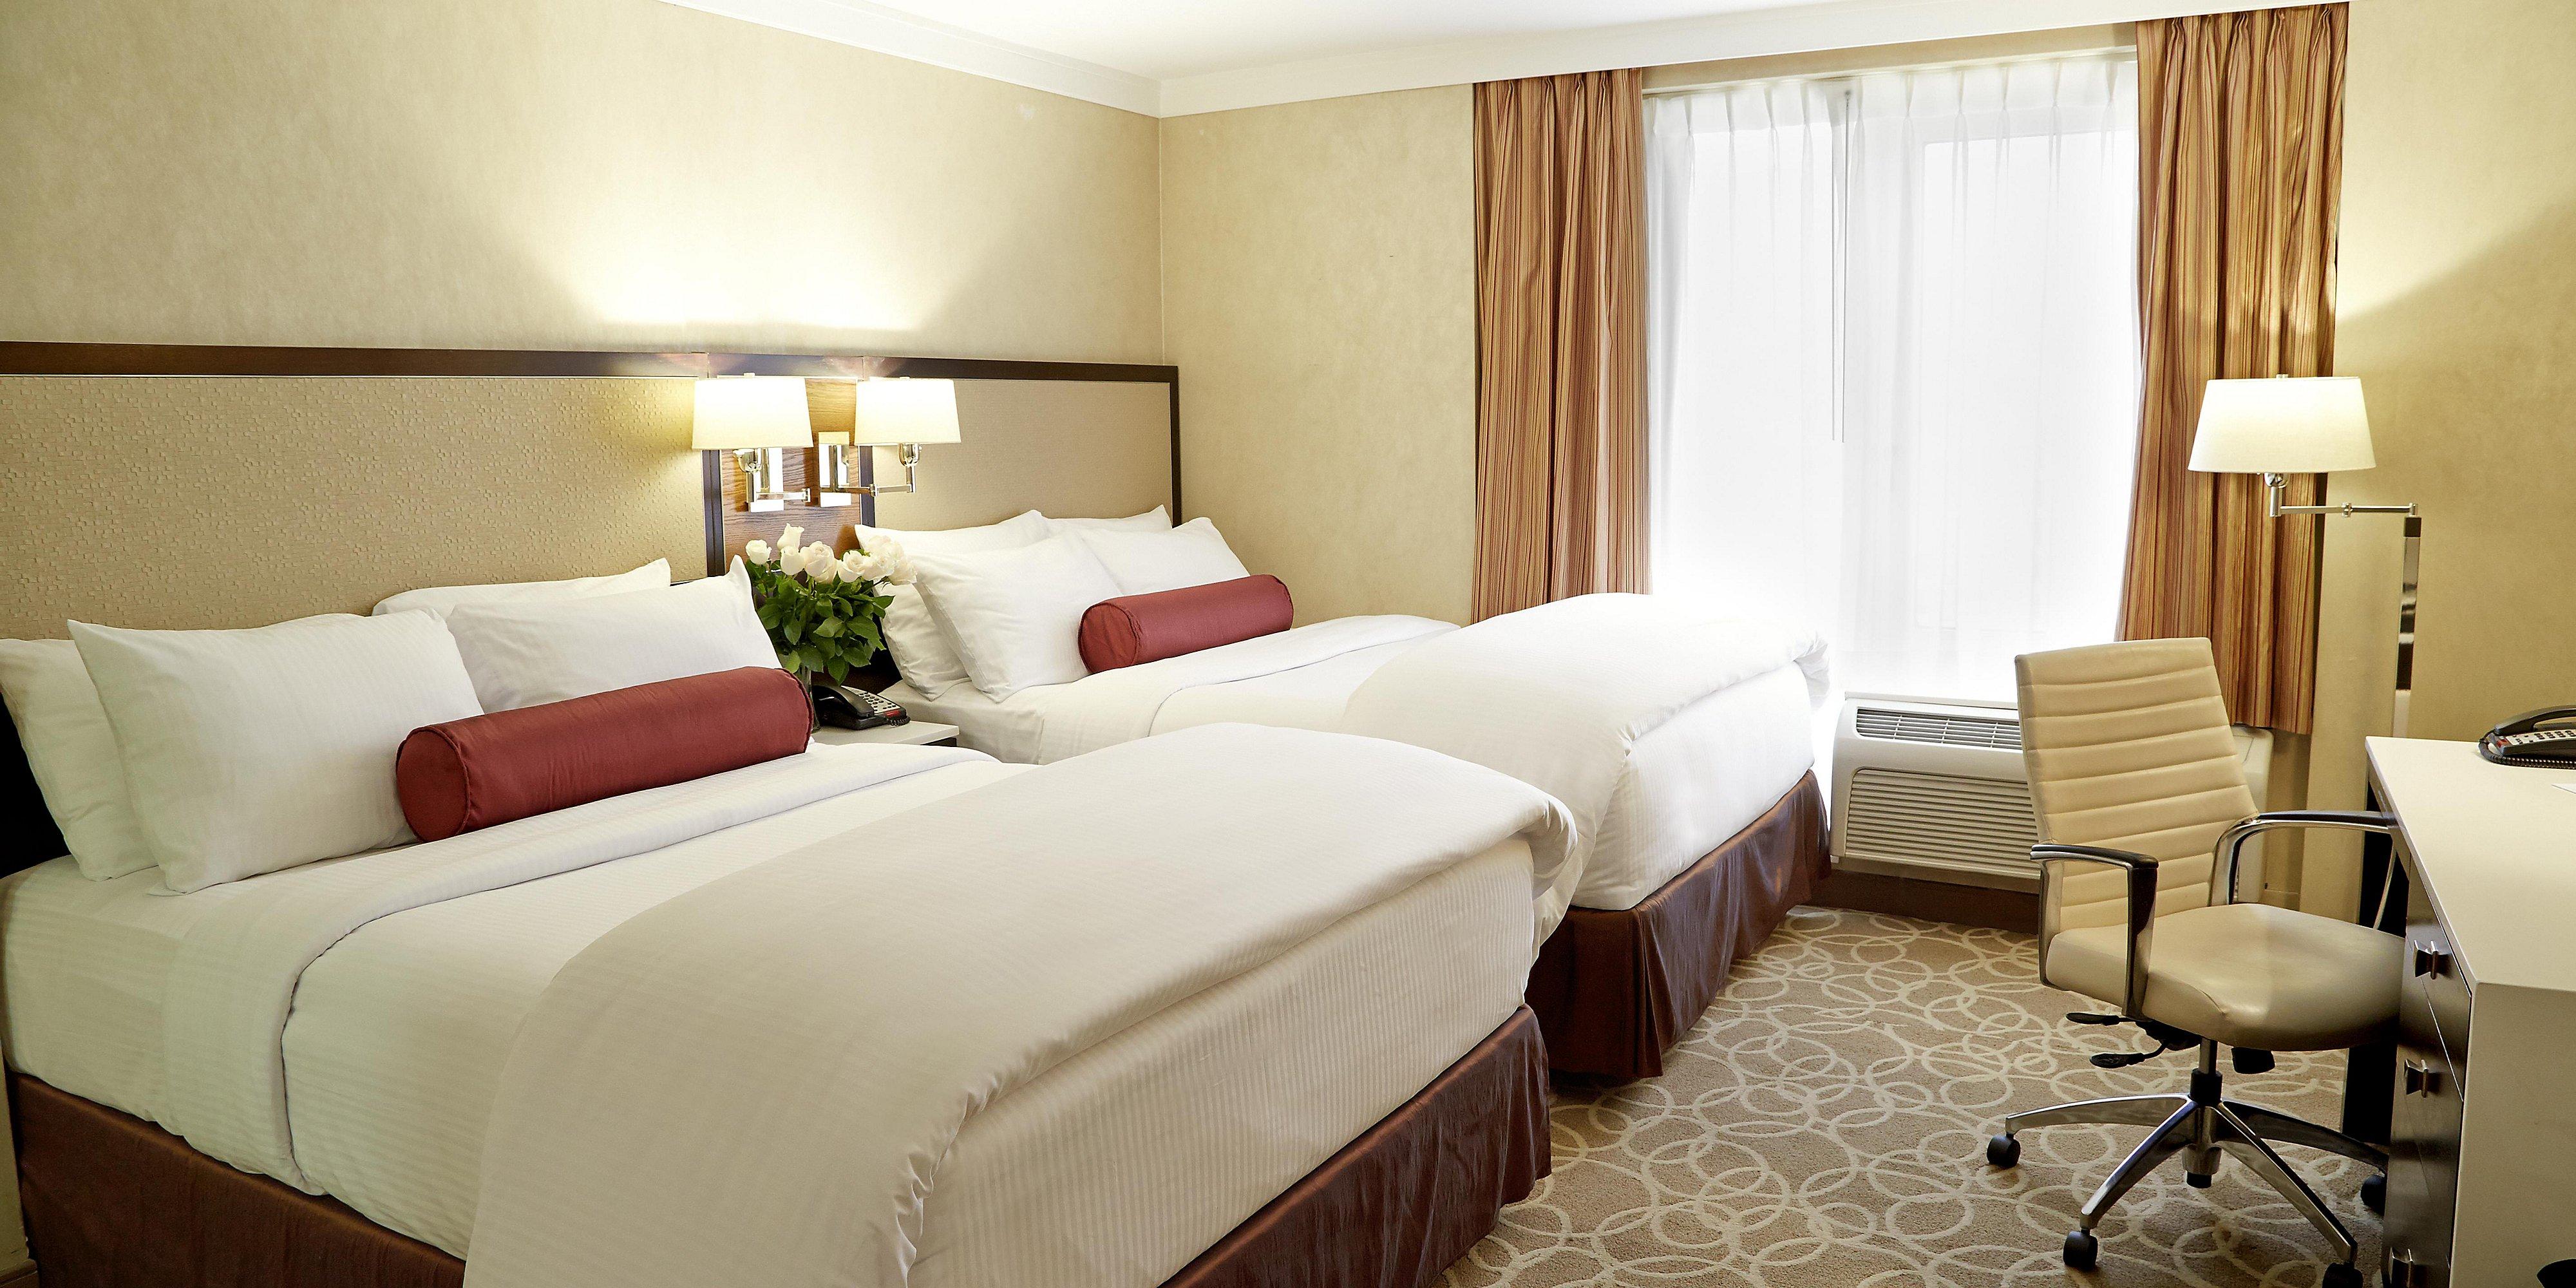 Staybridge Suites New York Hotels Staybridge Suites Times Square